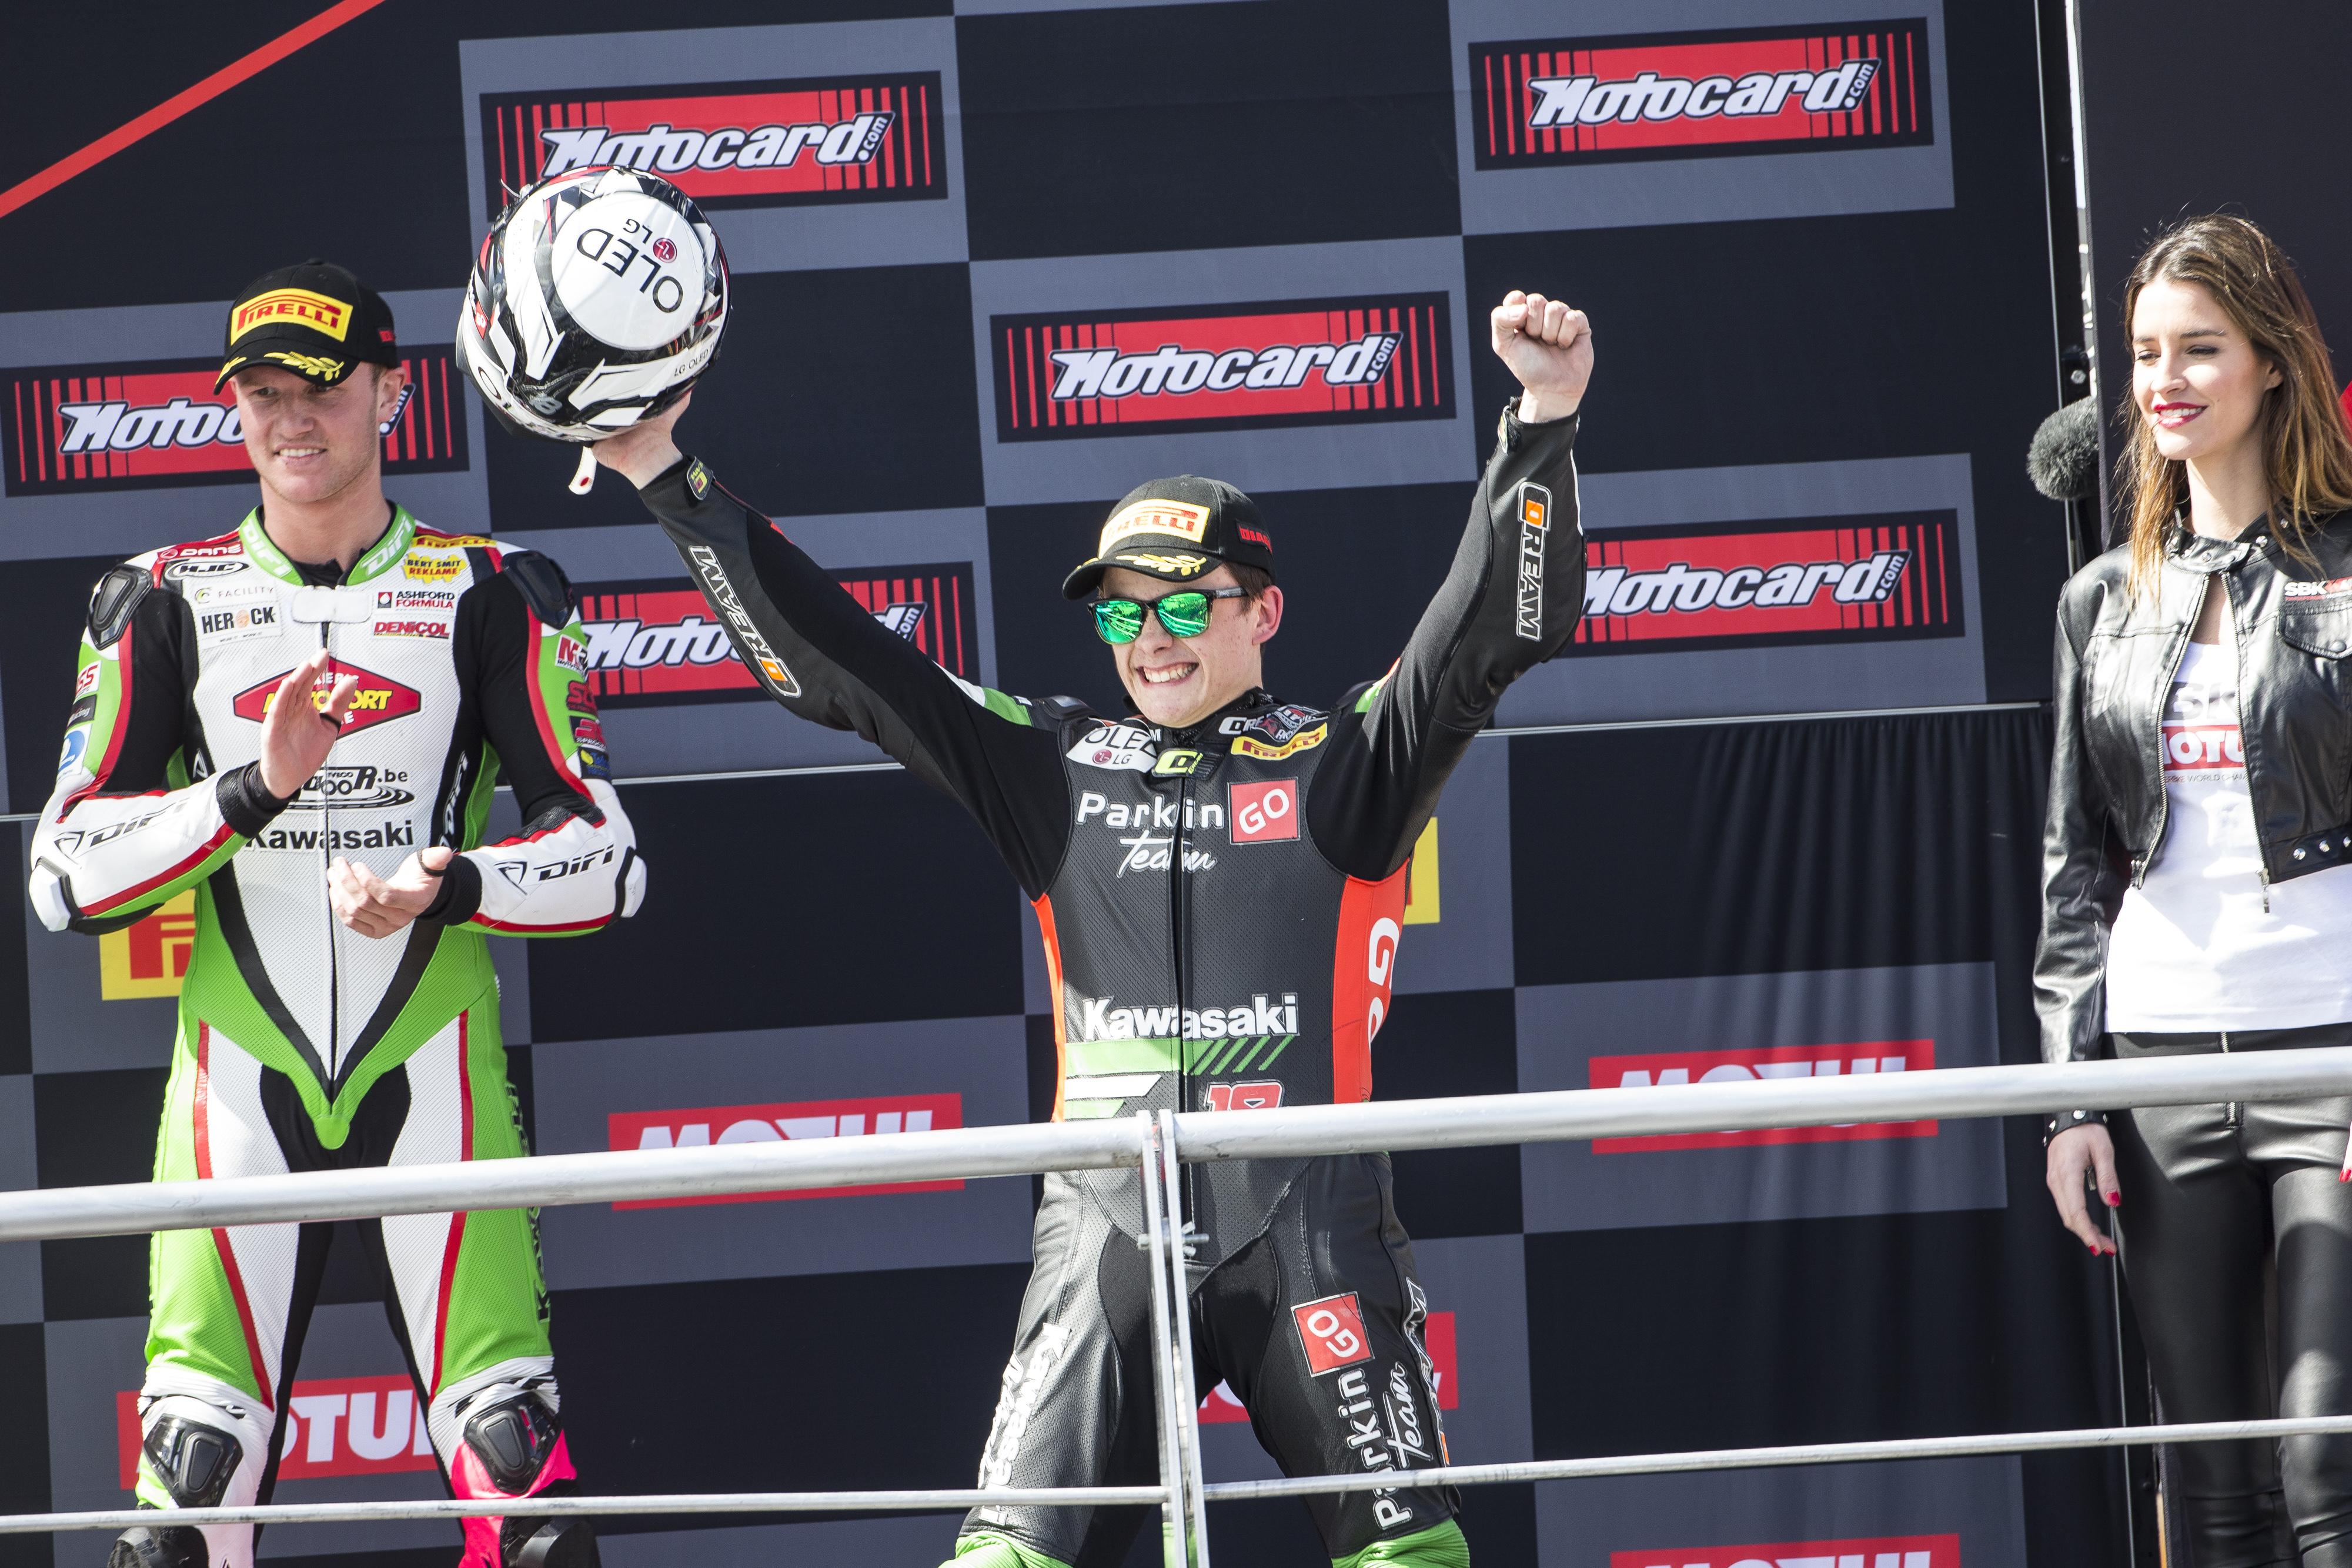 https://storage.kawasaki.eu/public/kawasaki.eu/en-EU/racingNews/hi_03_Aragon_2019_SSP300_Race_Gonzalez_C87Q3792.jpg